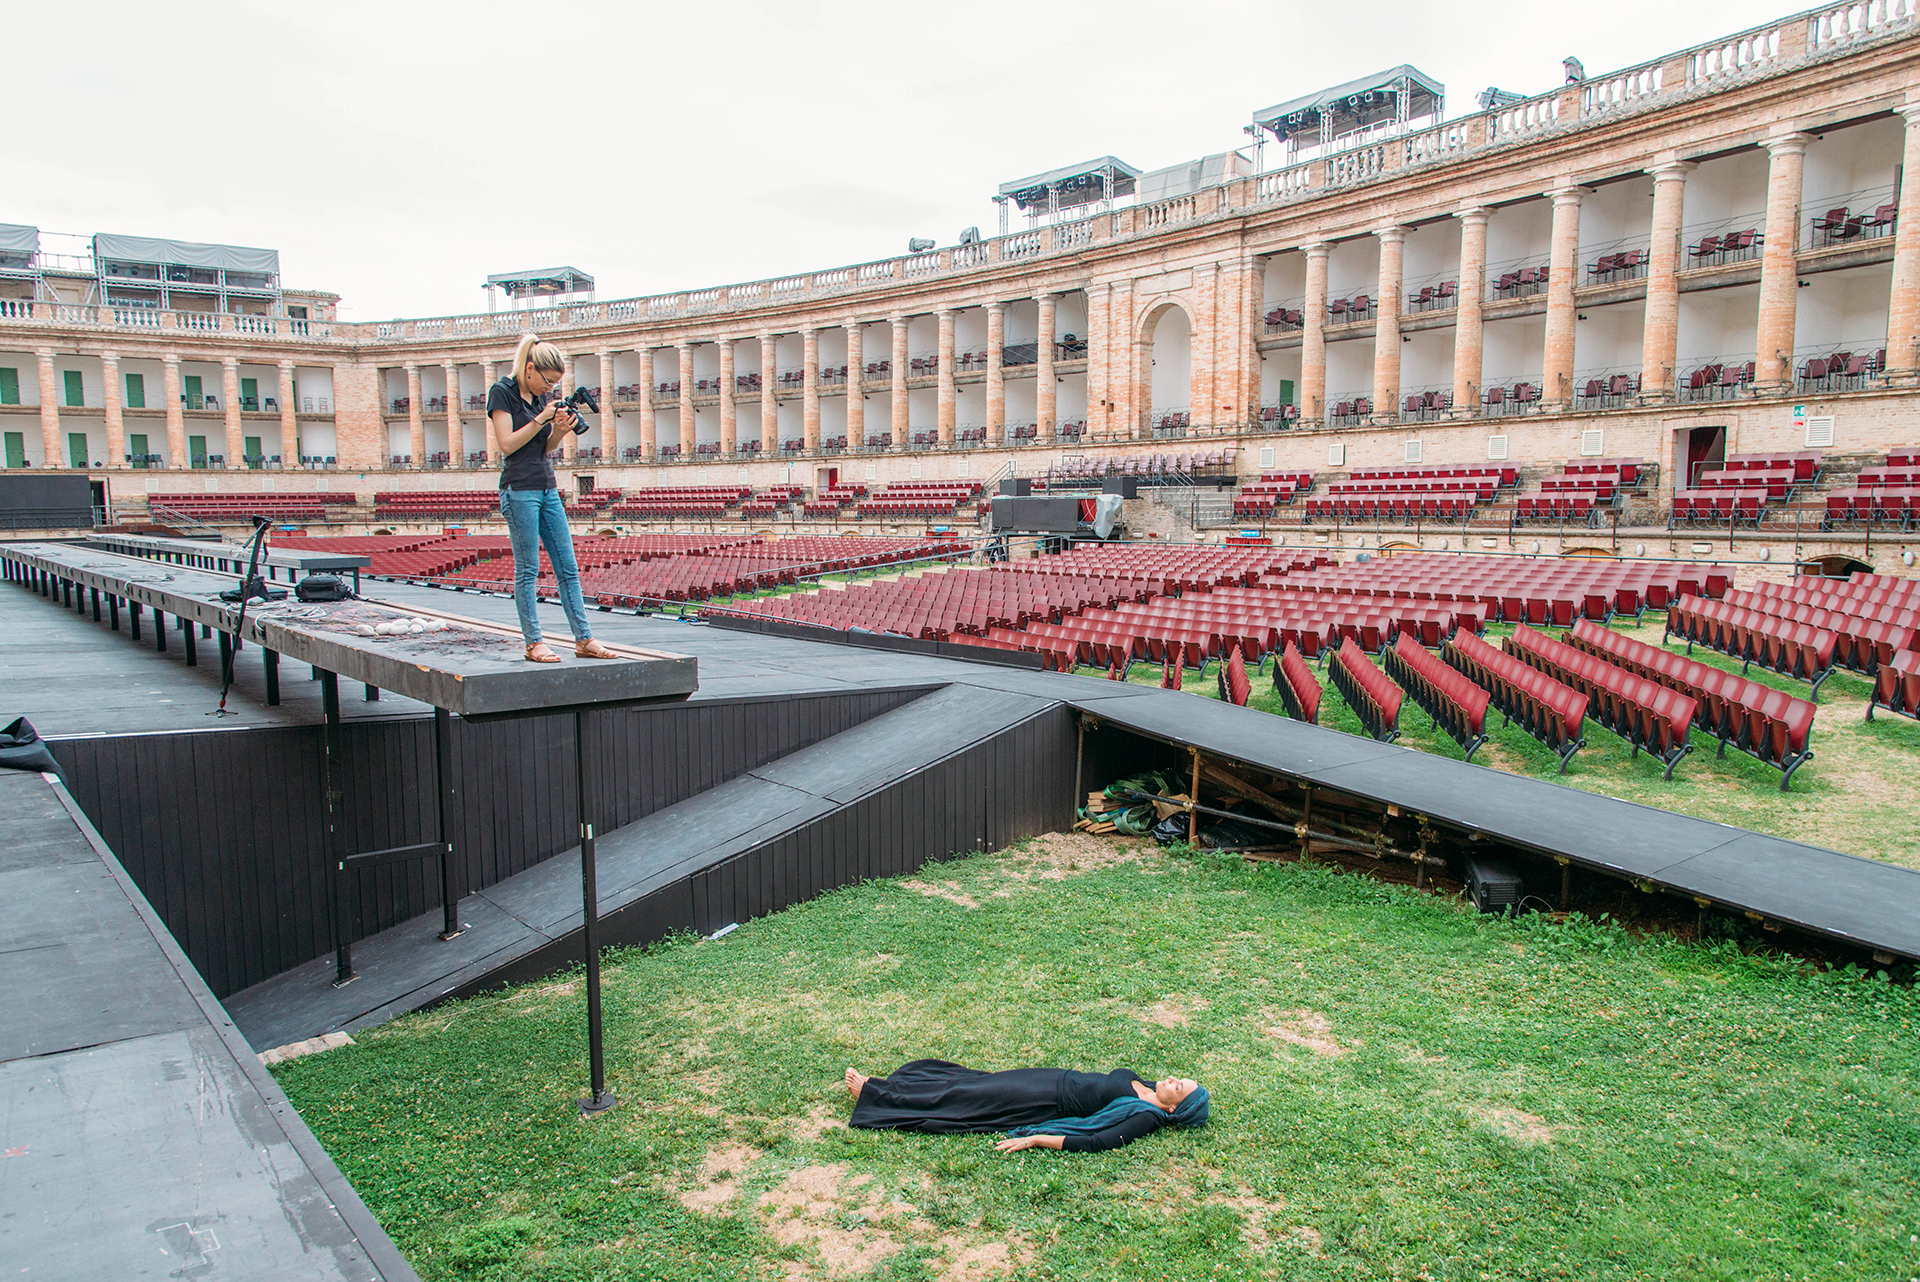 medea, Macerata opera Festival, alia simoncini videomaker